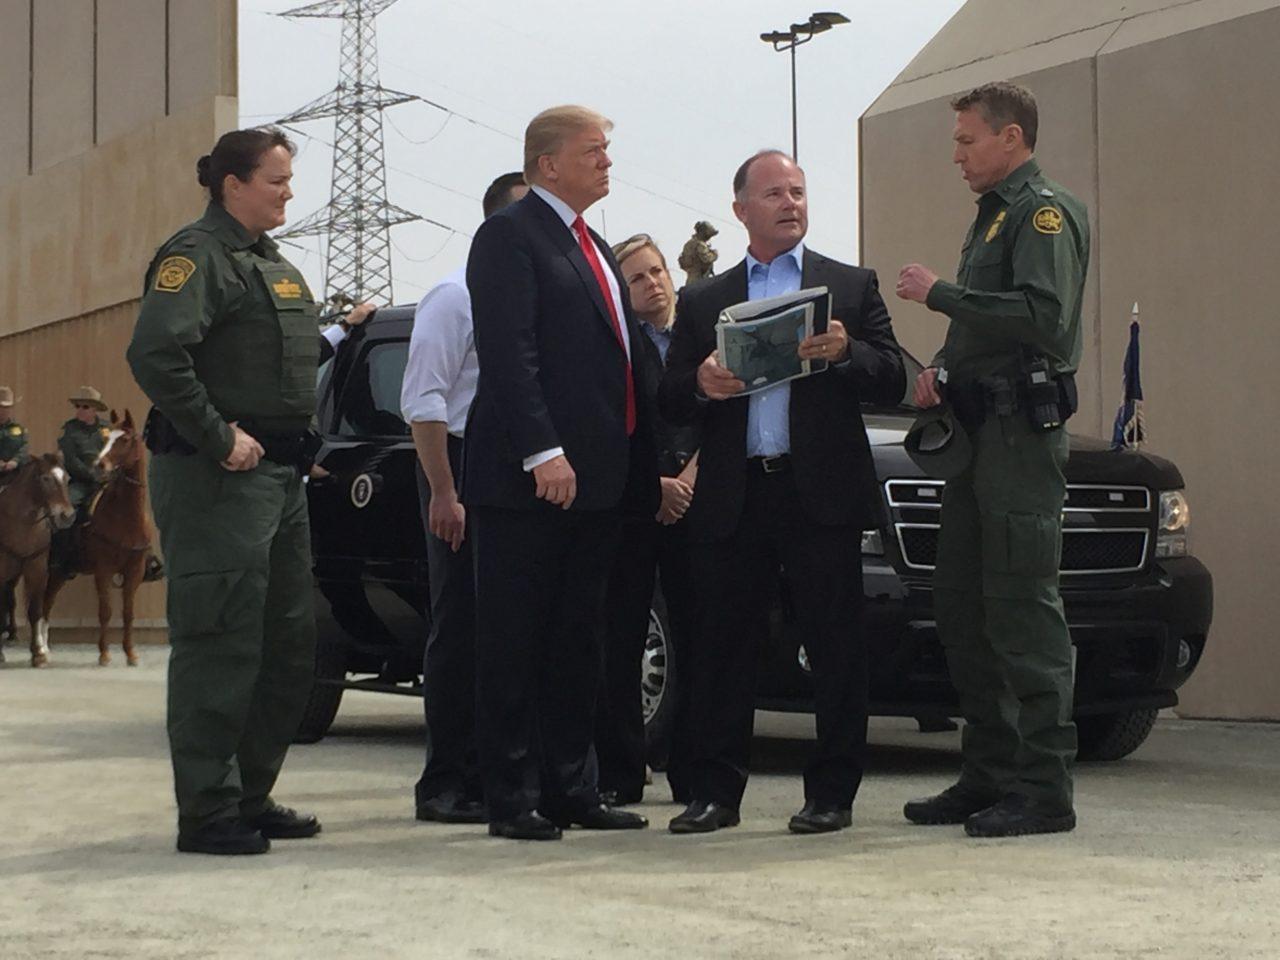 PHOTOS: President Donald Trump Visits Border Wall Prototypes | Breitbart